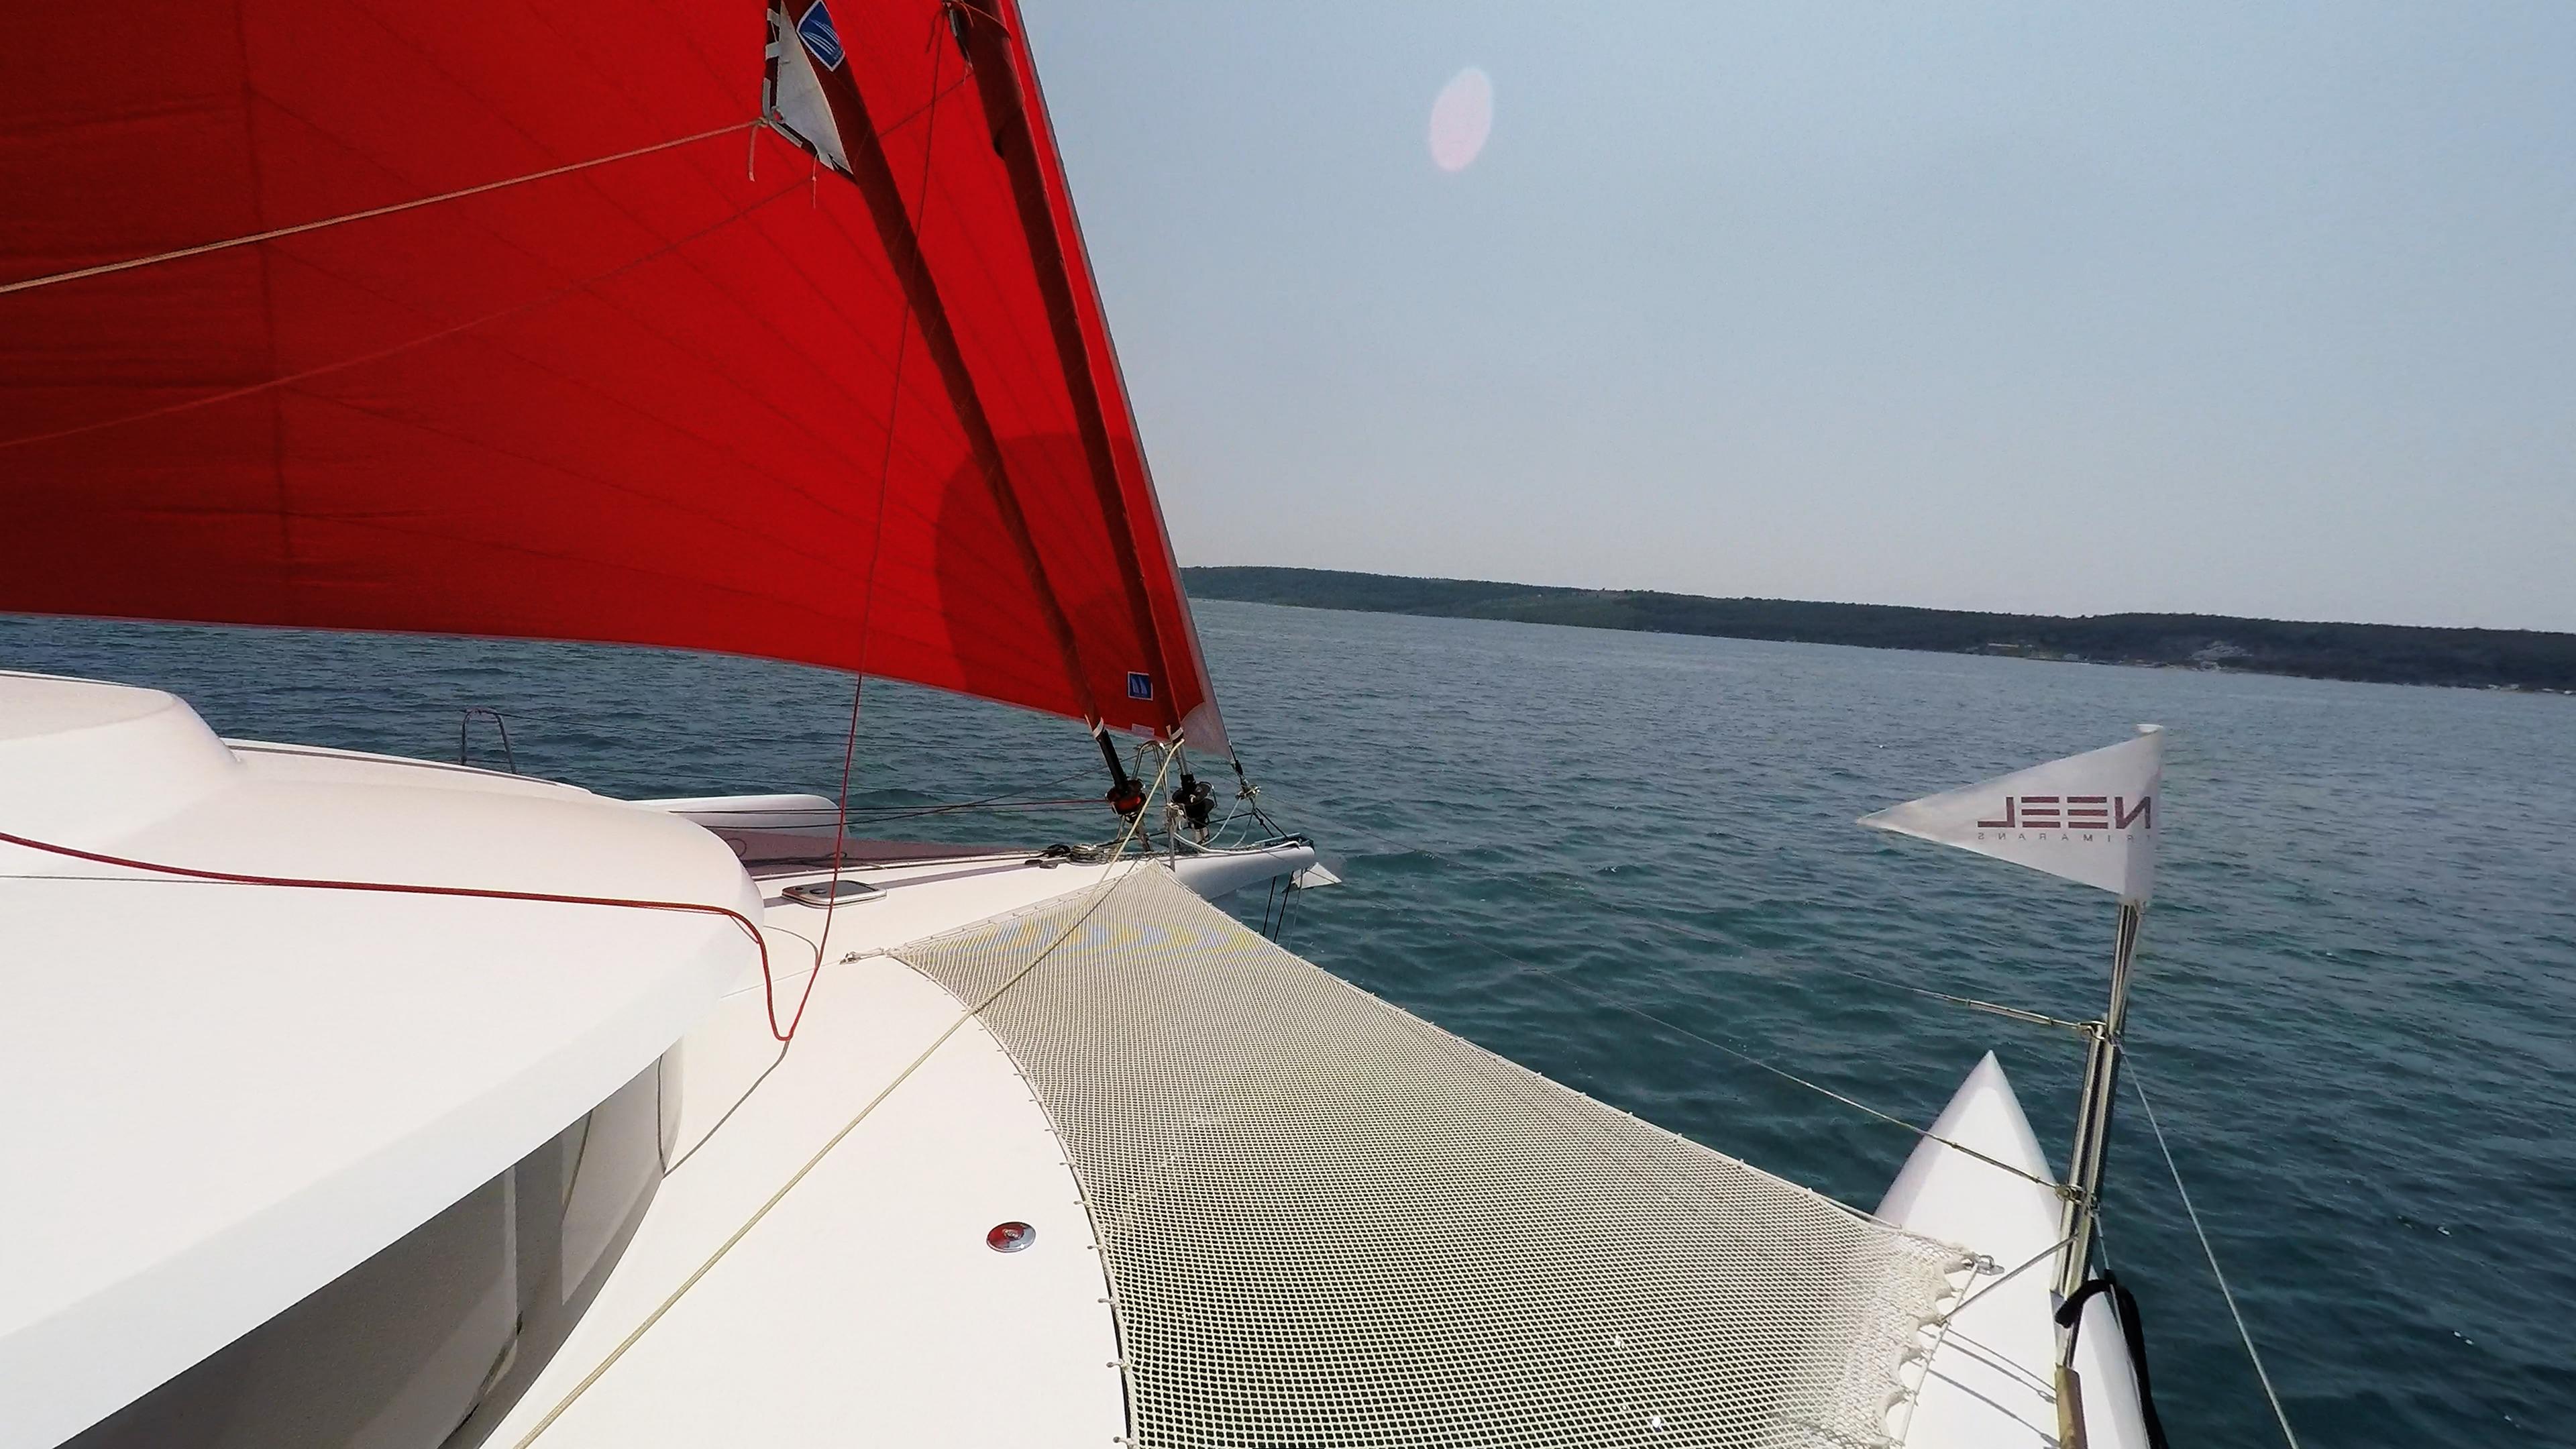 neel 45 prua trimarano yacht vela gennaker 1